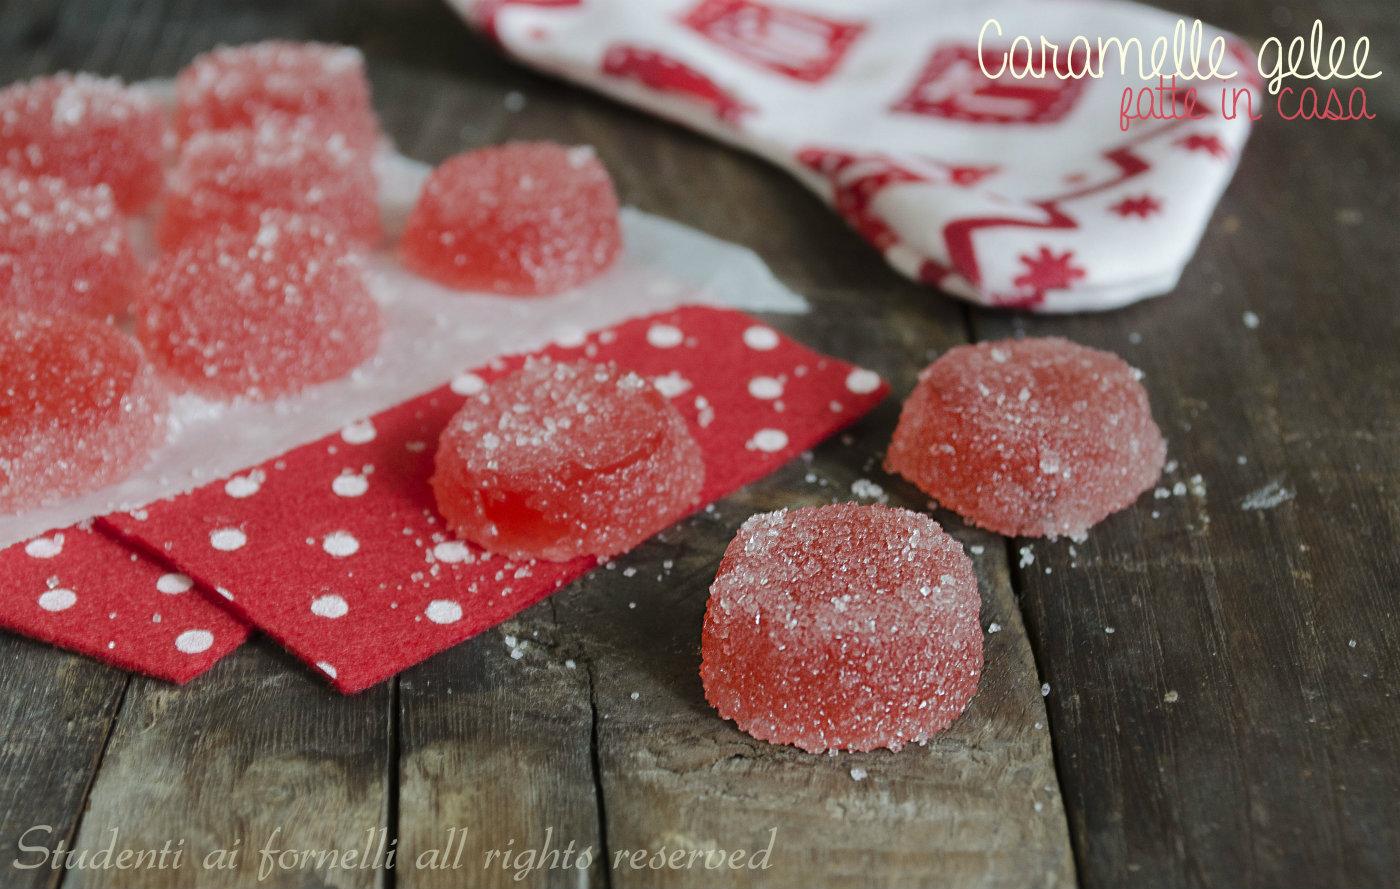 caramelle gelee fatte in casa befana ricetta caramelle gommose con lo zucchero caramelle gelatina facile